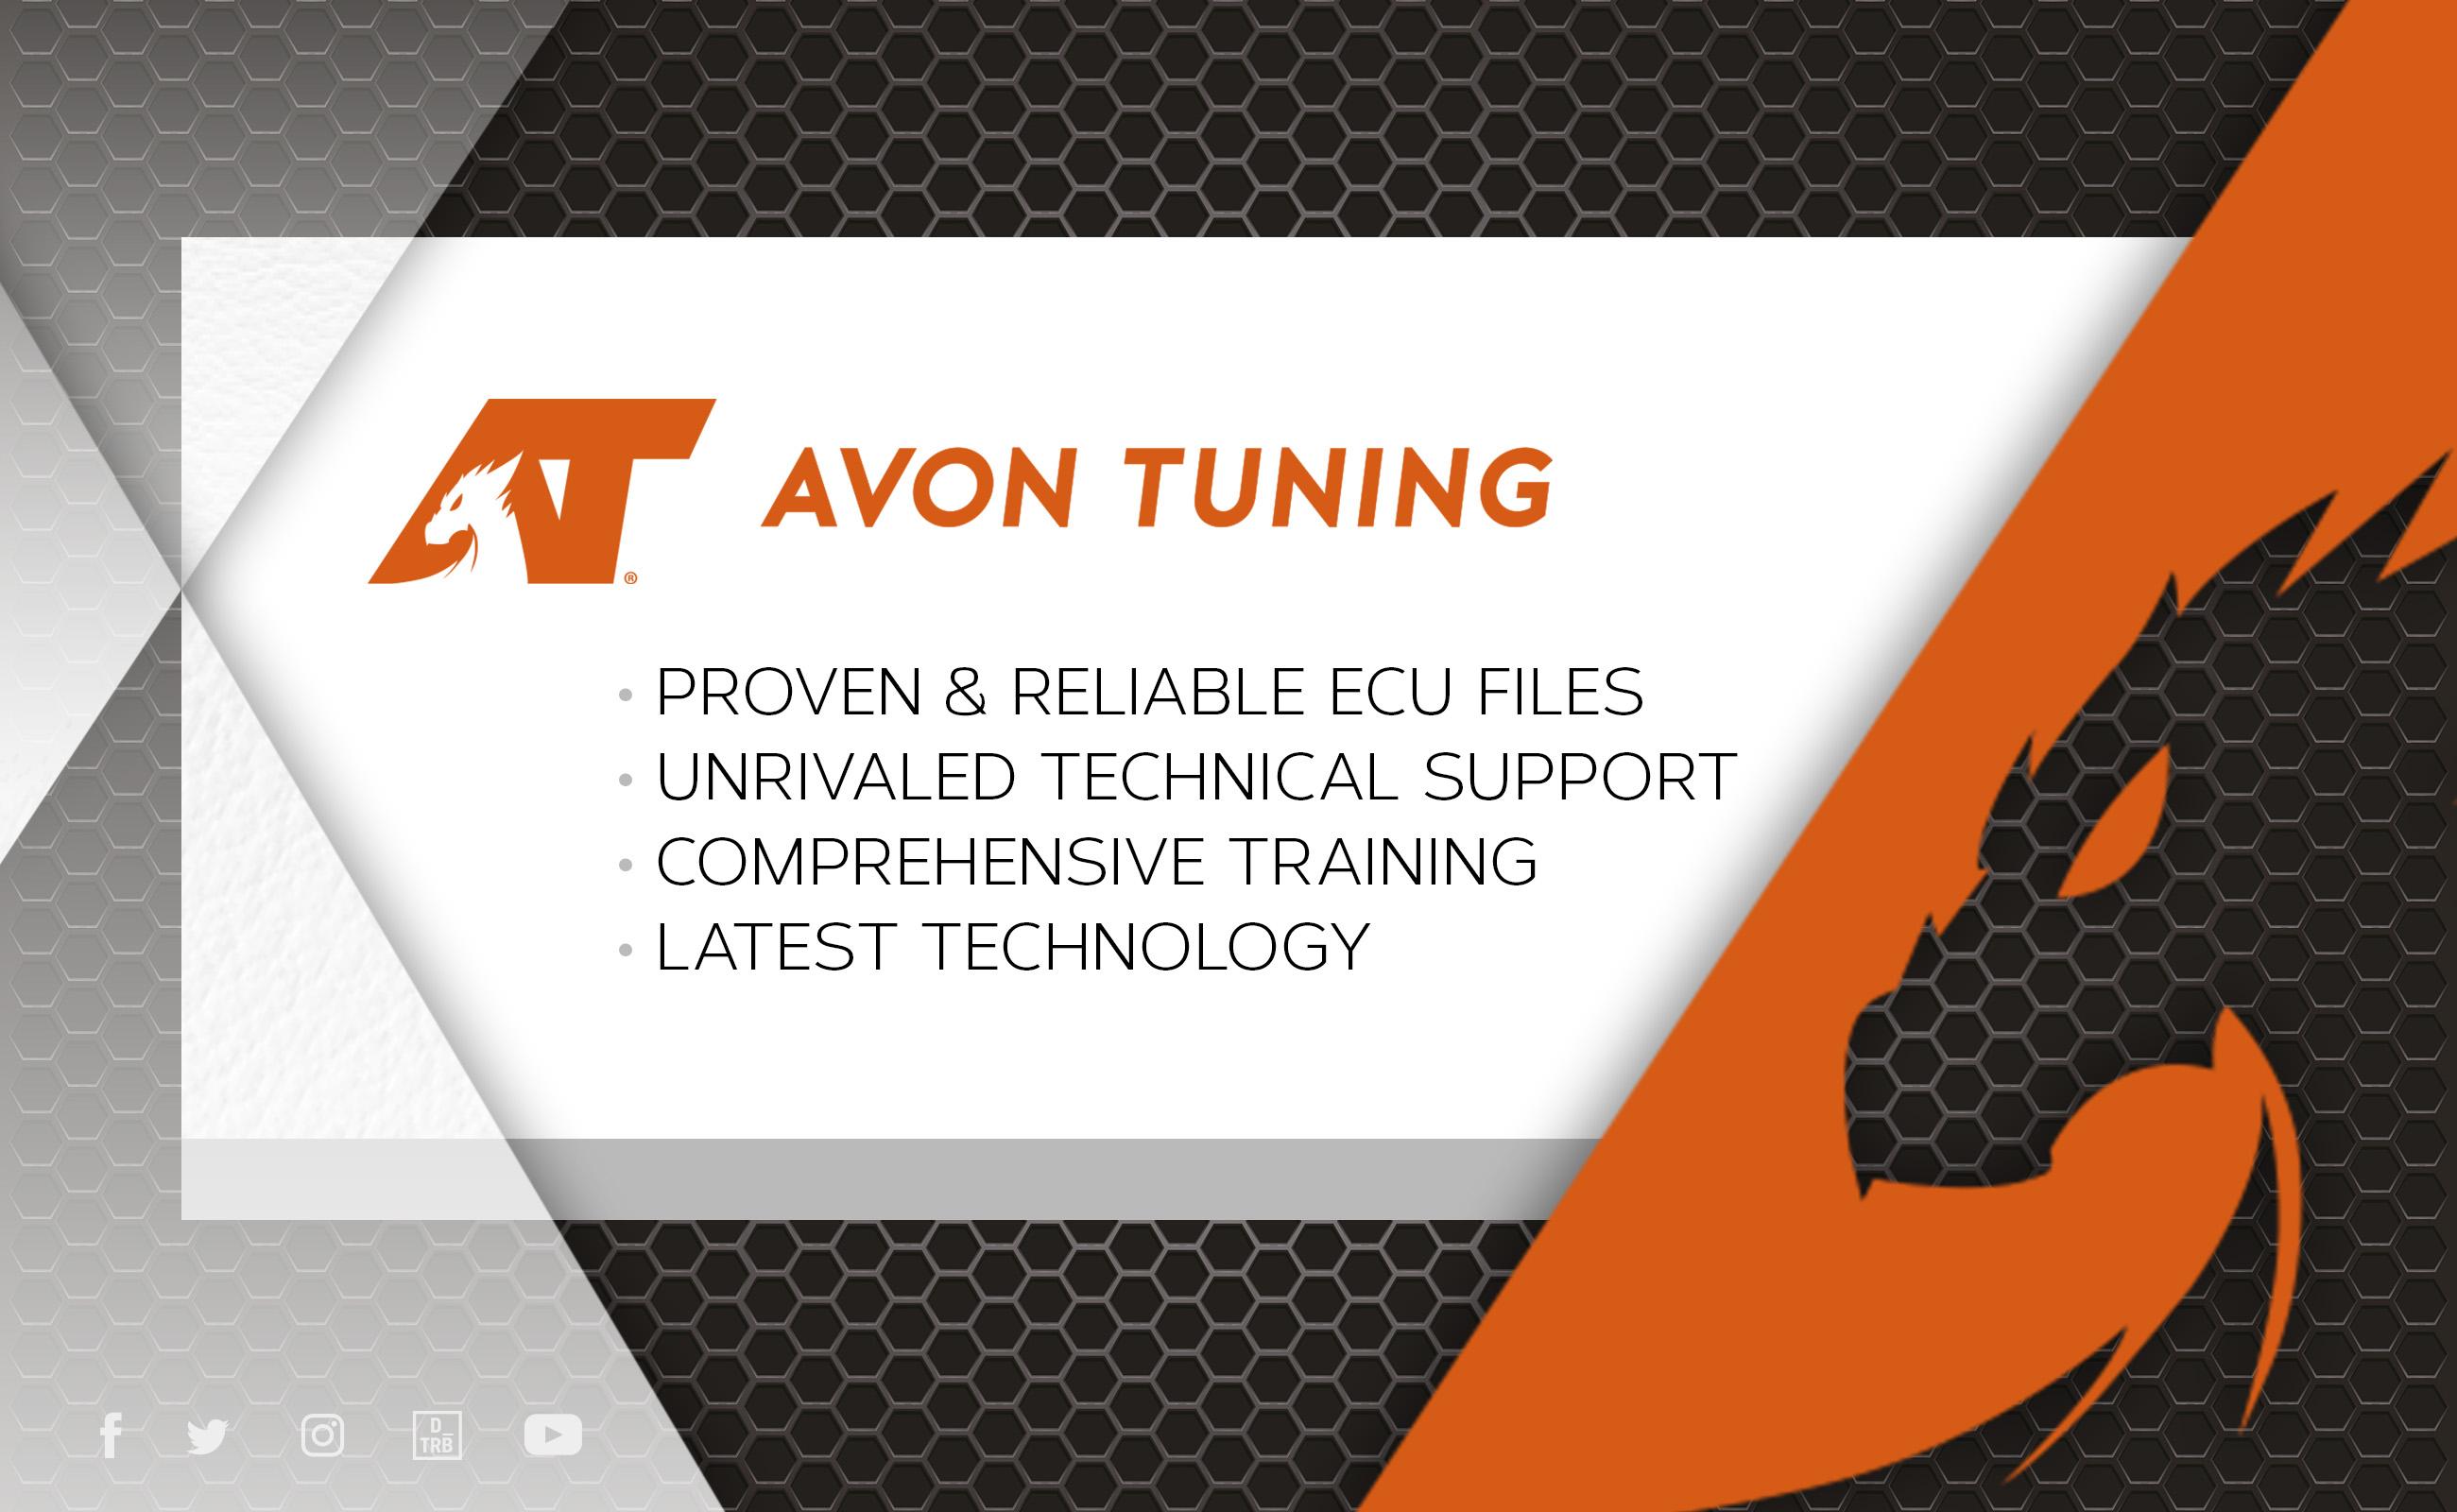 Avon Tuning